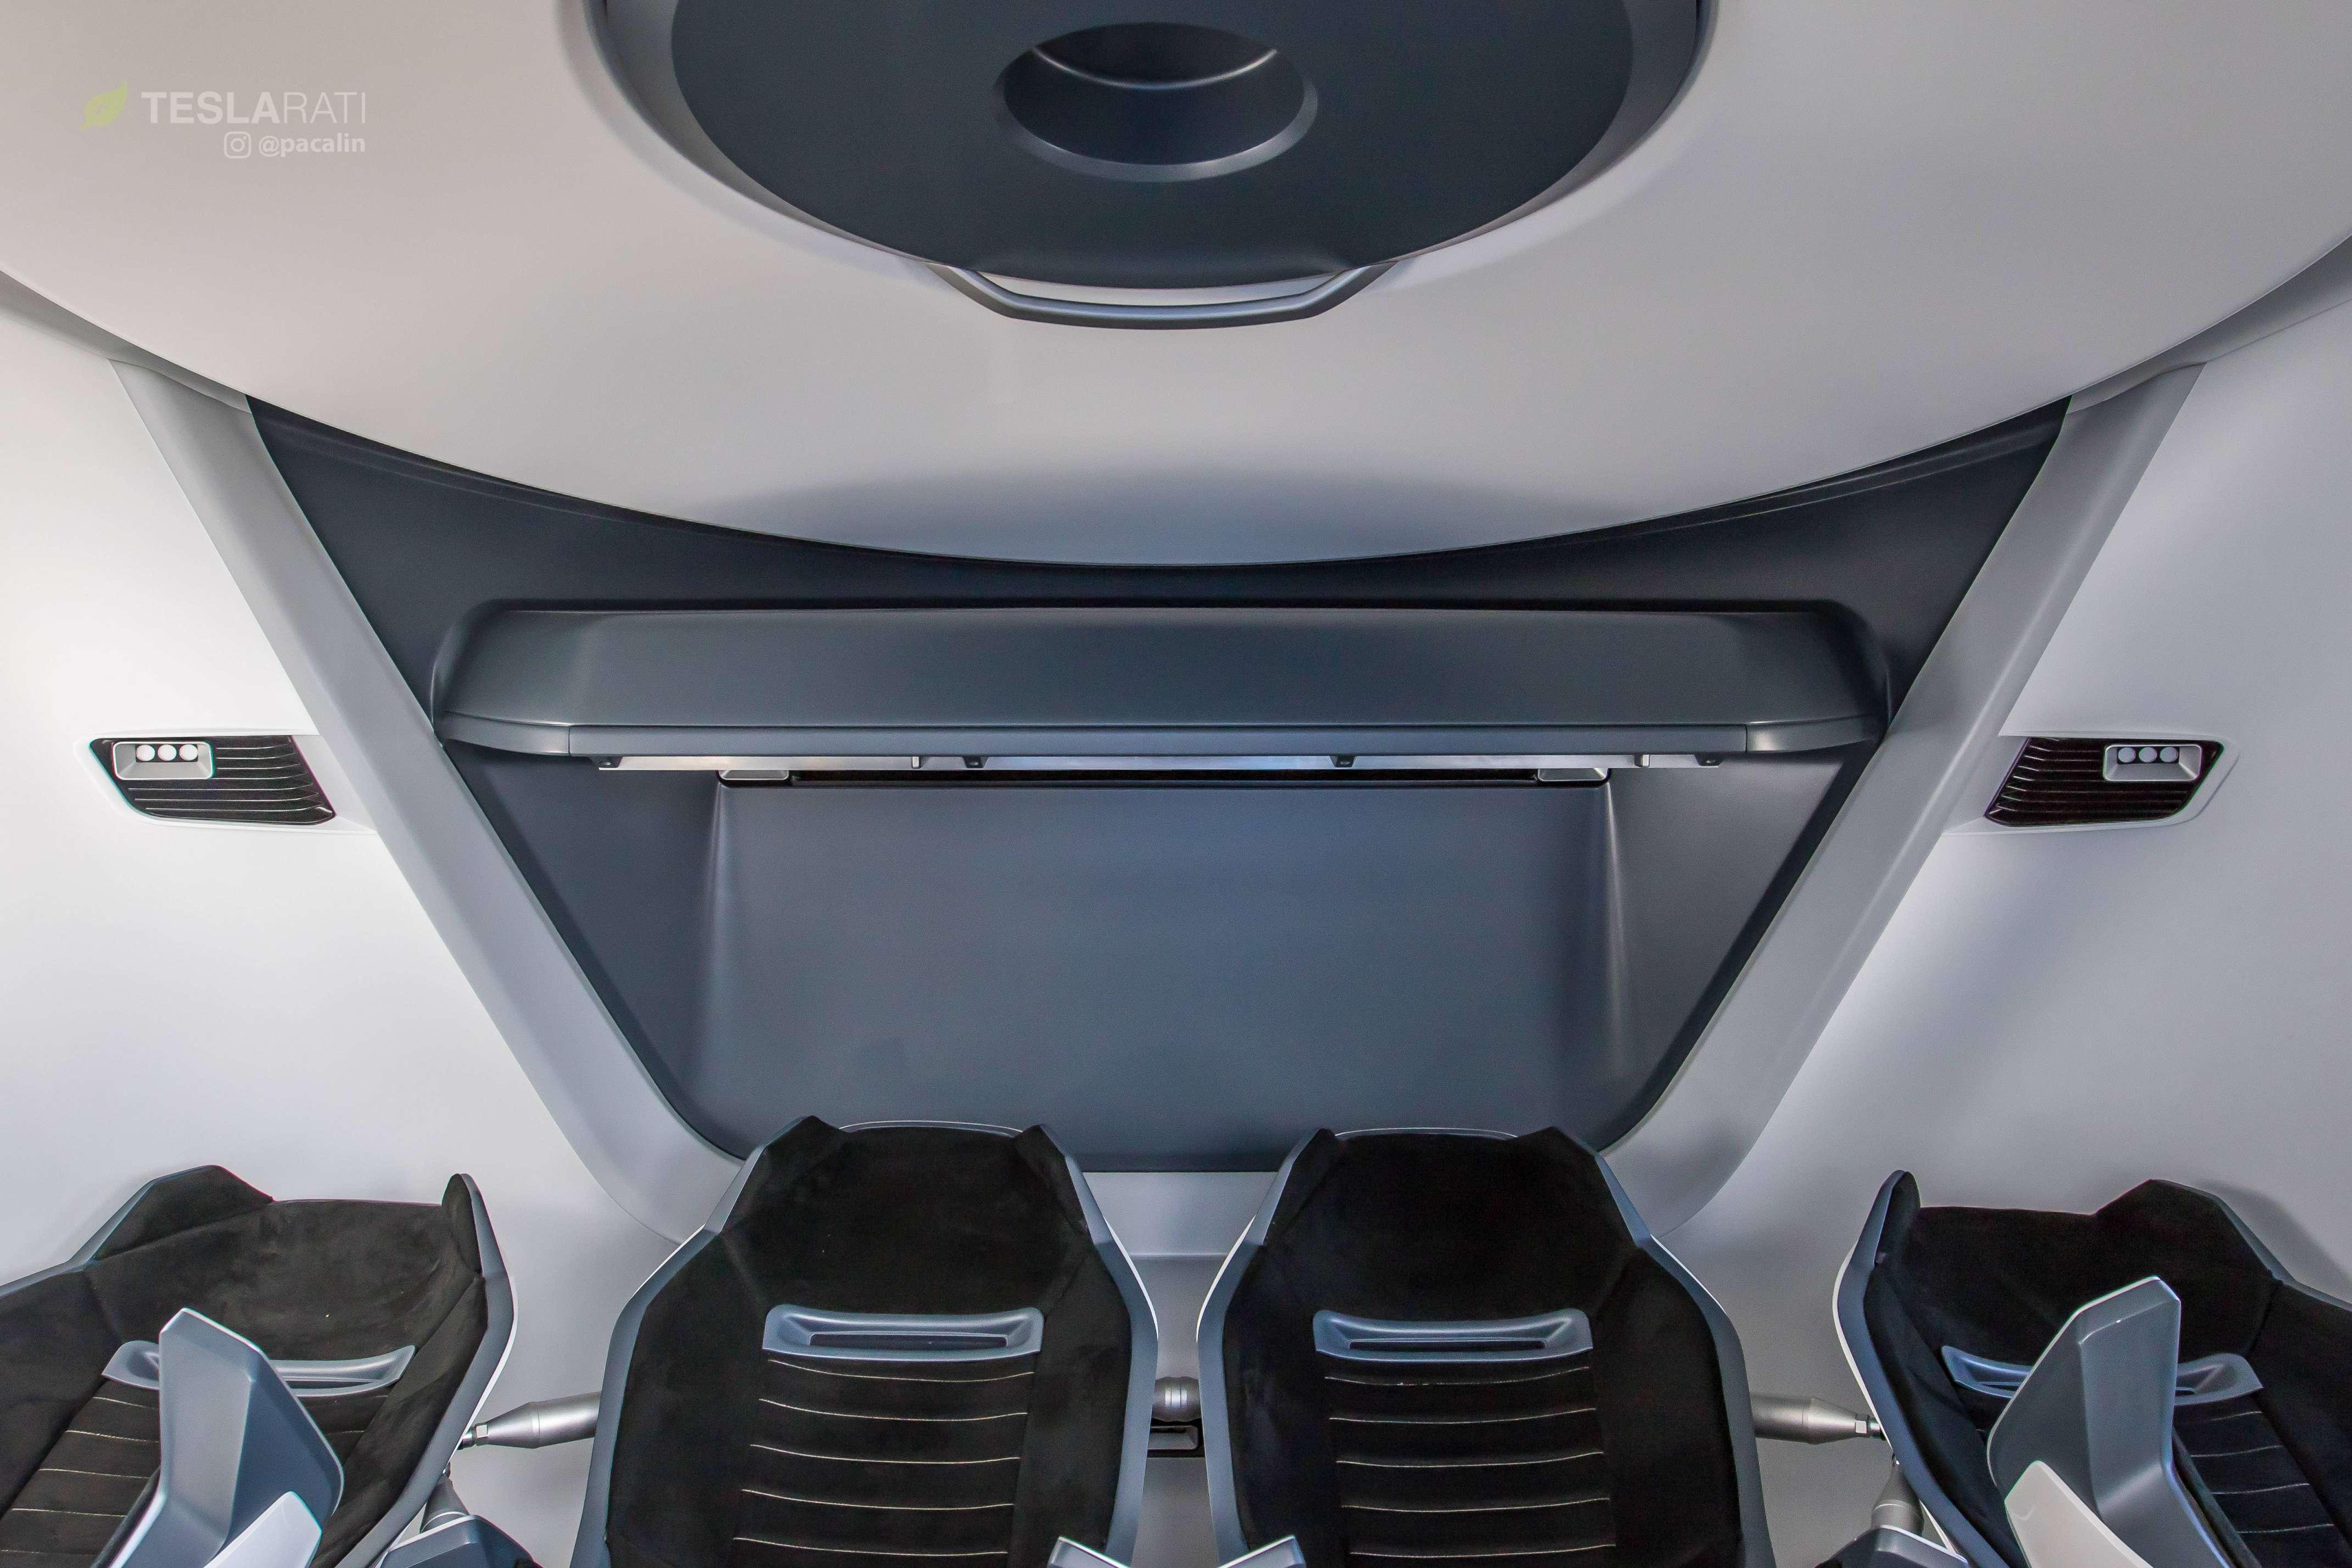 Crew Dragon simulator cabin 081318 (SpaceX) 4 (c)